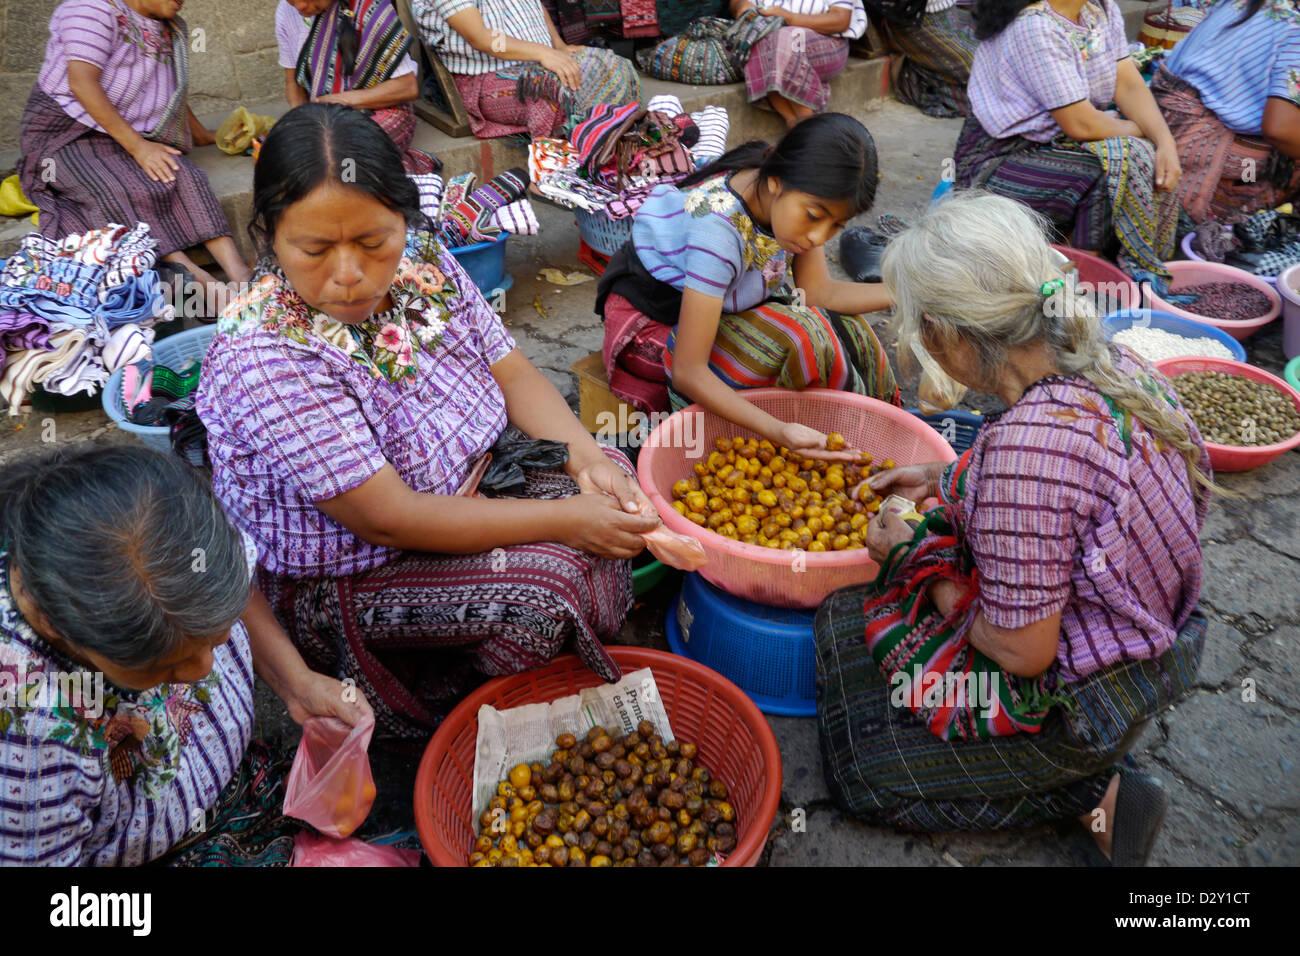 mayan market scenes santiago atitlan latin america central economy trade food tribal indigenous woman female - Stock Image